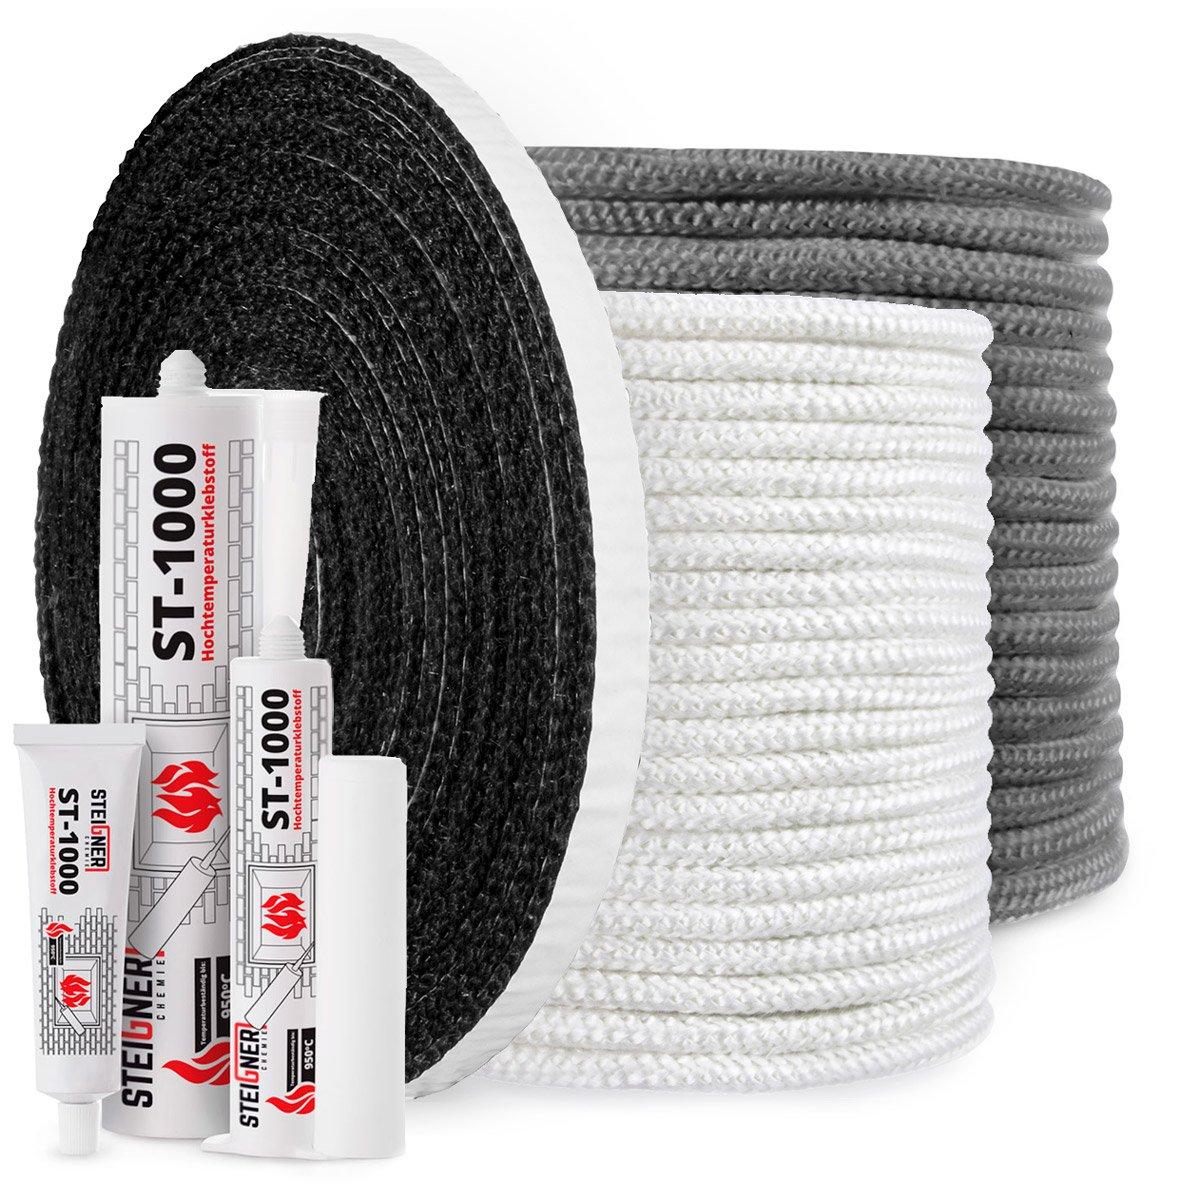 Negro sellador resiste al calor hasta 550/°C 1 m 10x2mm STEIGNER Banda de Fibra de Vidrio de Chimenea SKD03